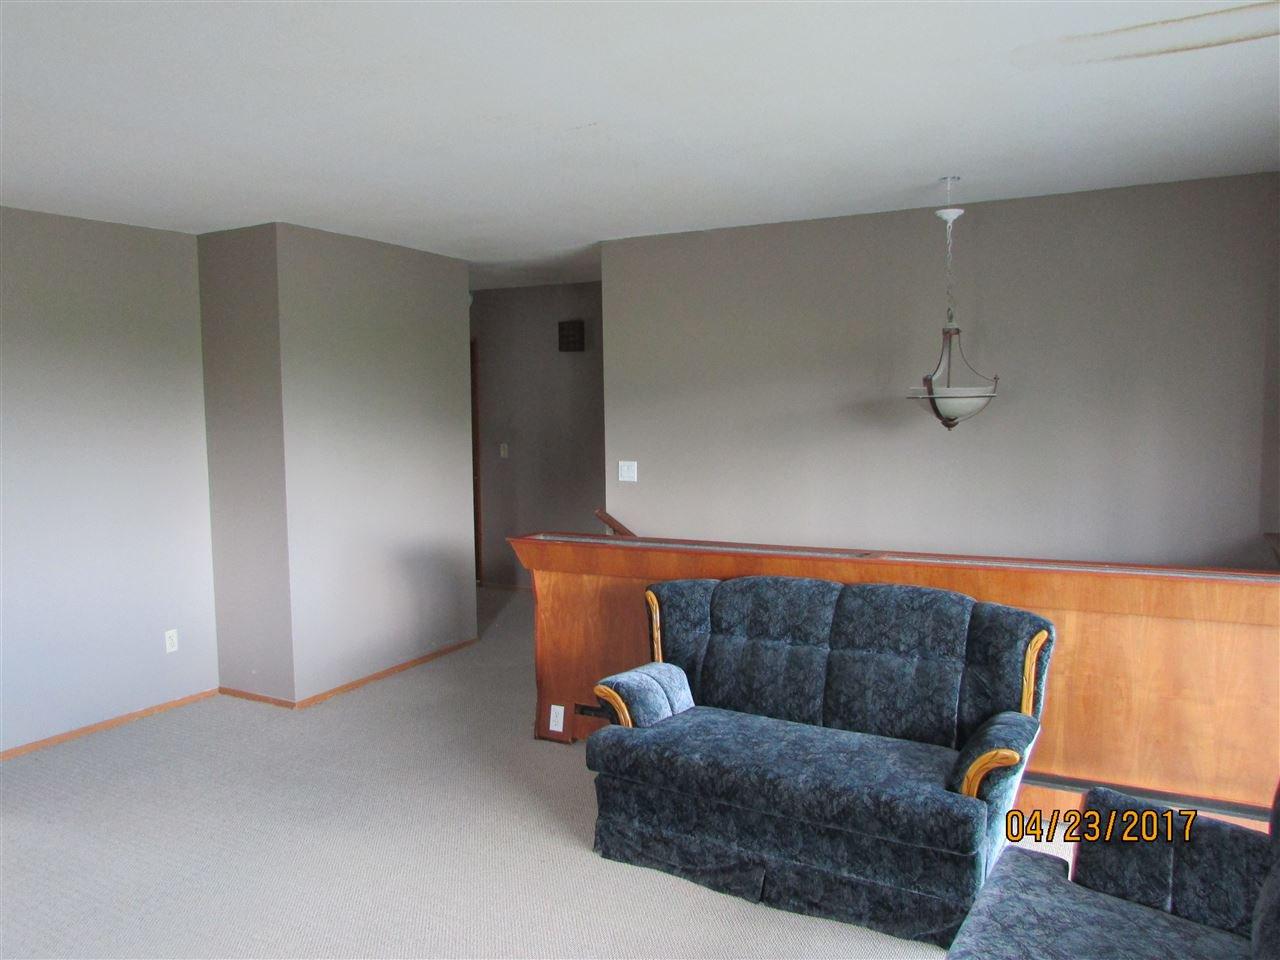 Photo 14: Photos: 7220 EVANS Road in Sardis: Sardis West Vedder Rd House for sale : MLS®# R2160379